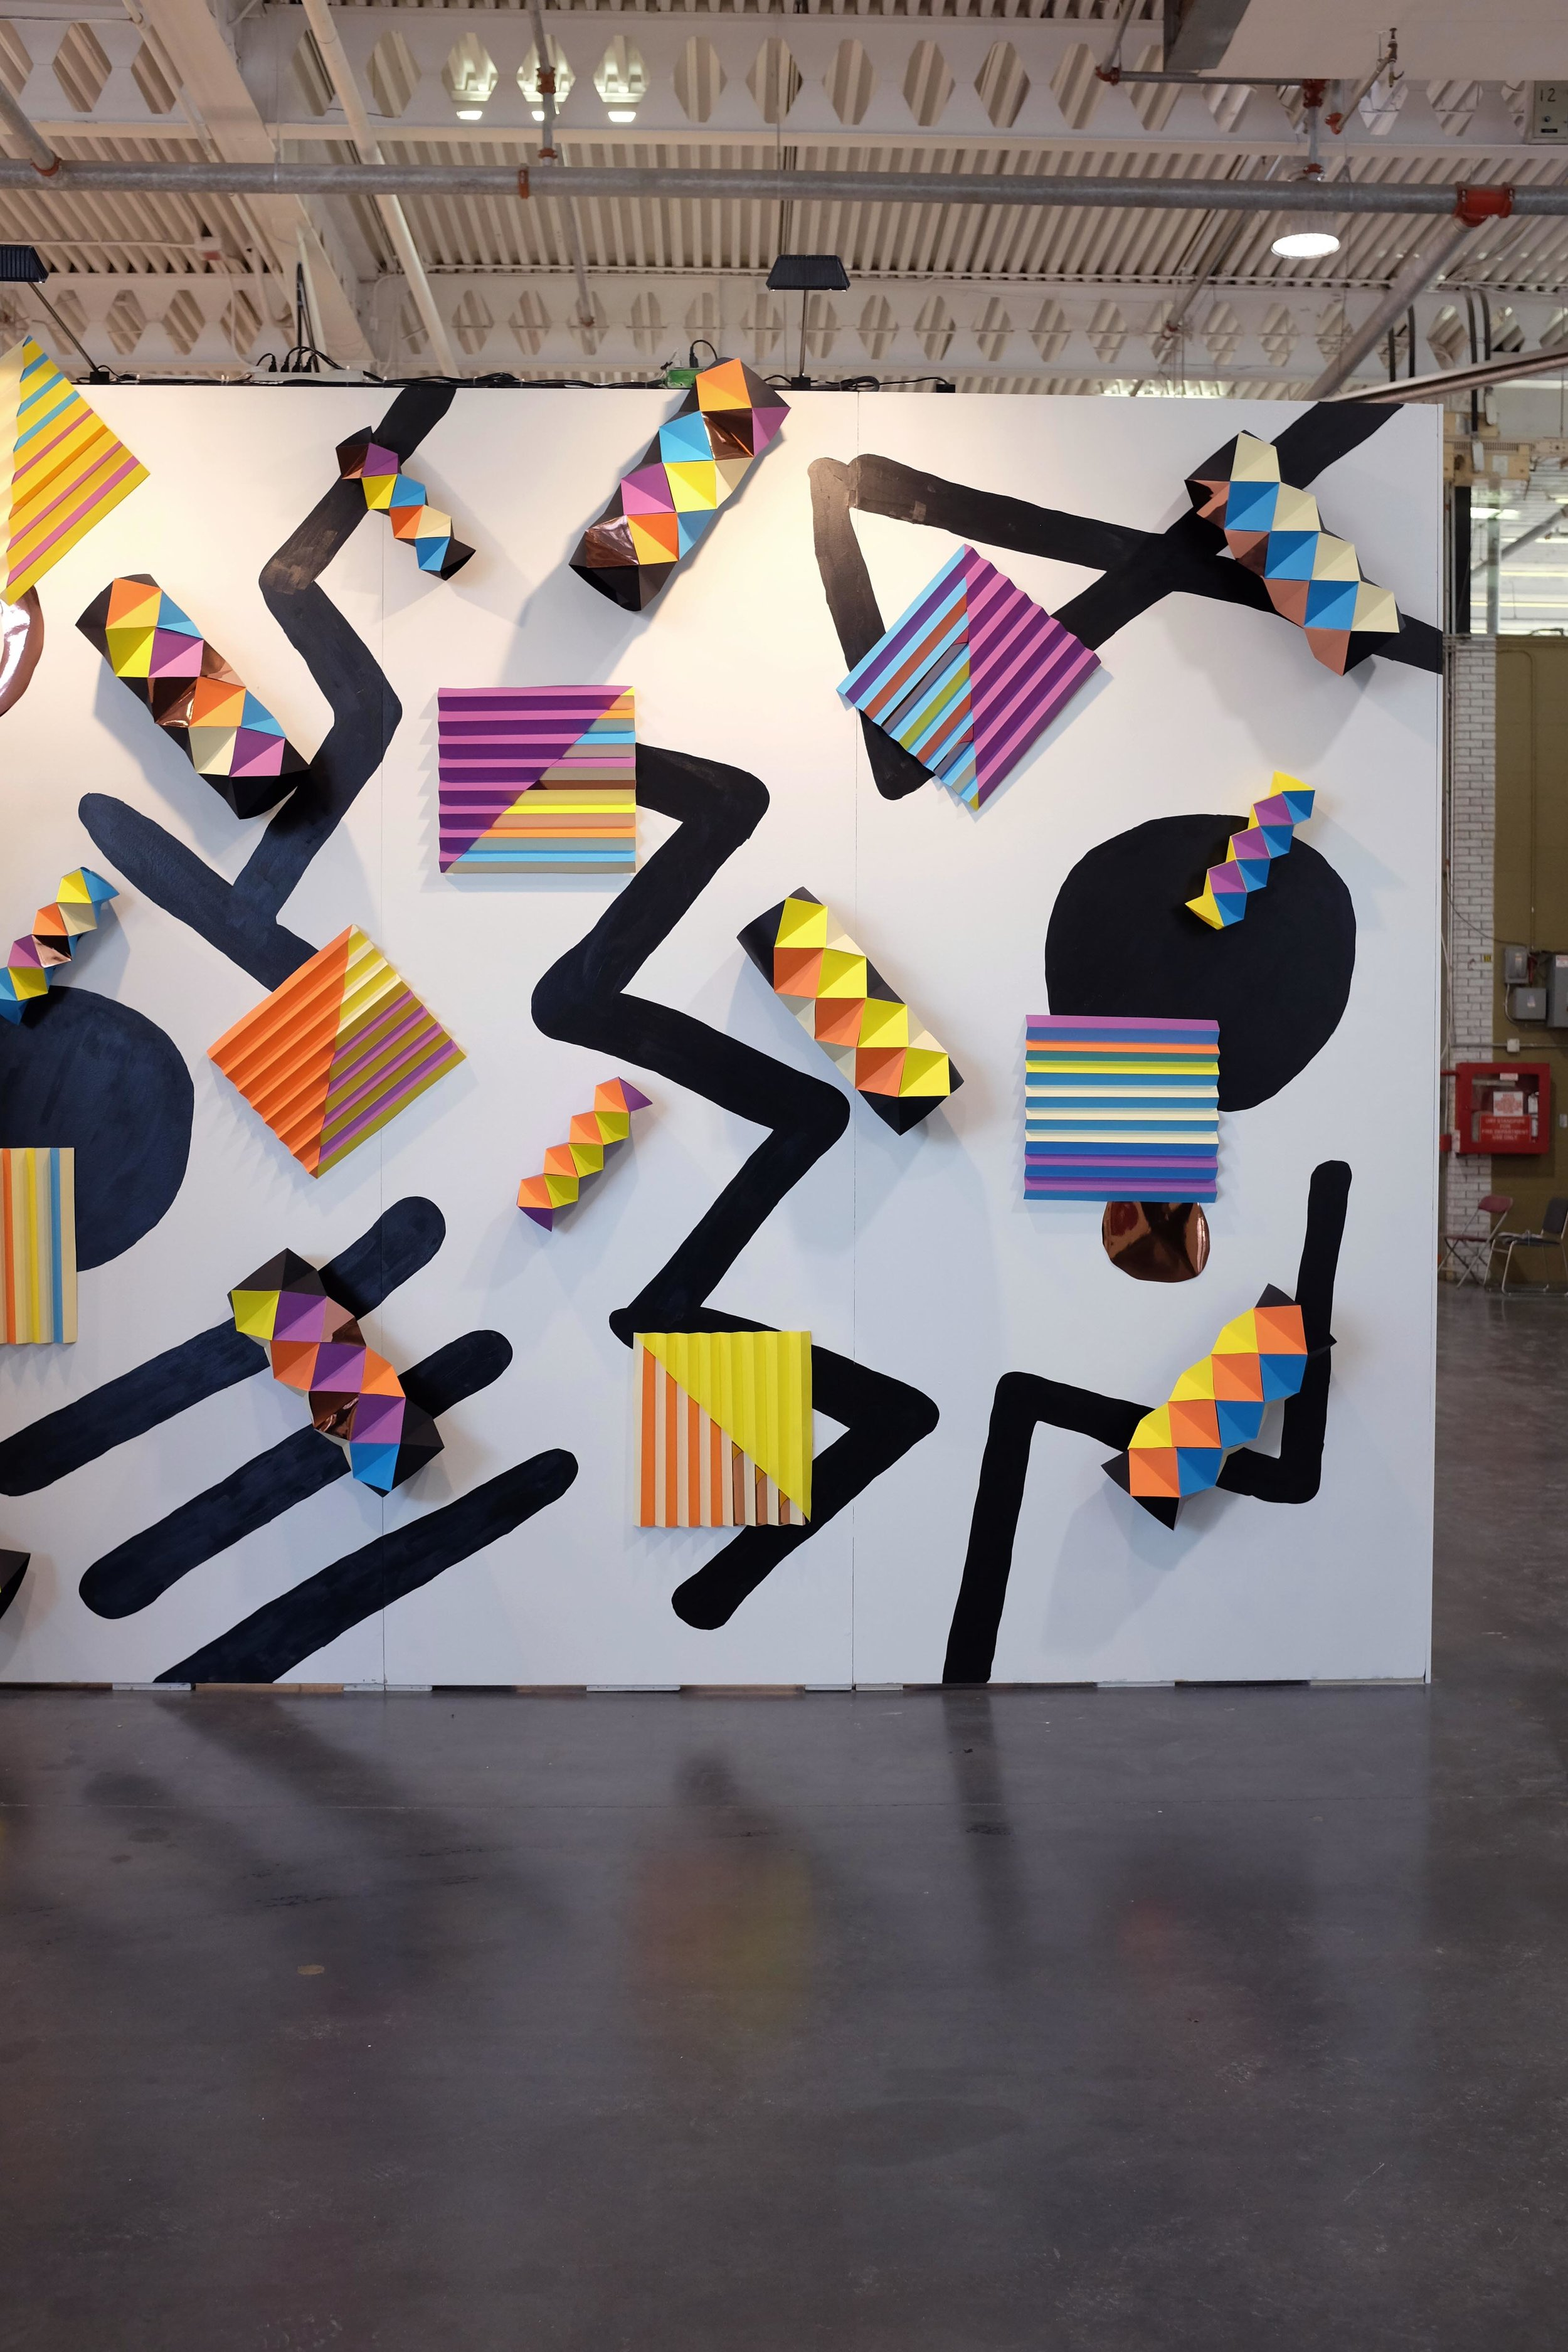 miss-cloudy-pauline-loctin-artist-project-2019-paper-art-origami-entrance-toronto-3.jpg